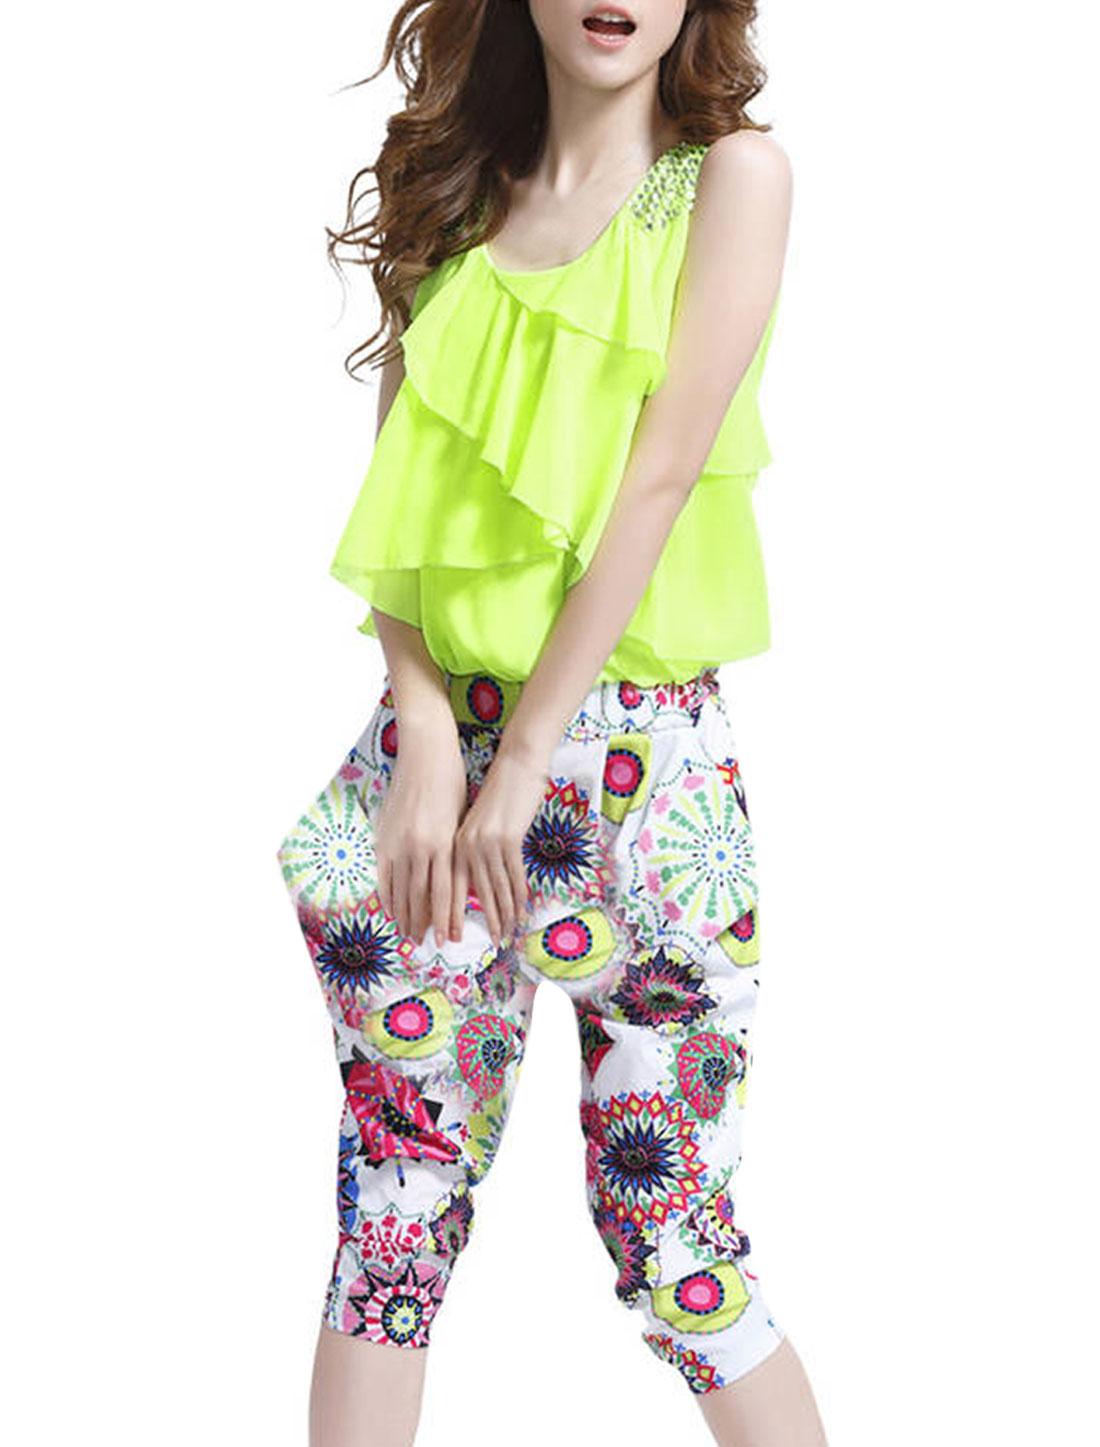 Scoop Neck Sleeveless Fake Crystal Decor Shoulder Lime Short Jumpsuit for Lady S